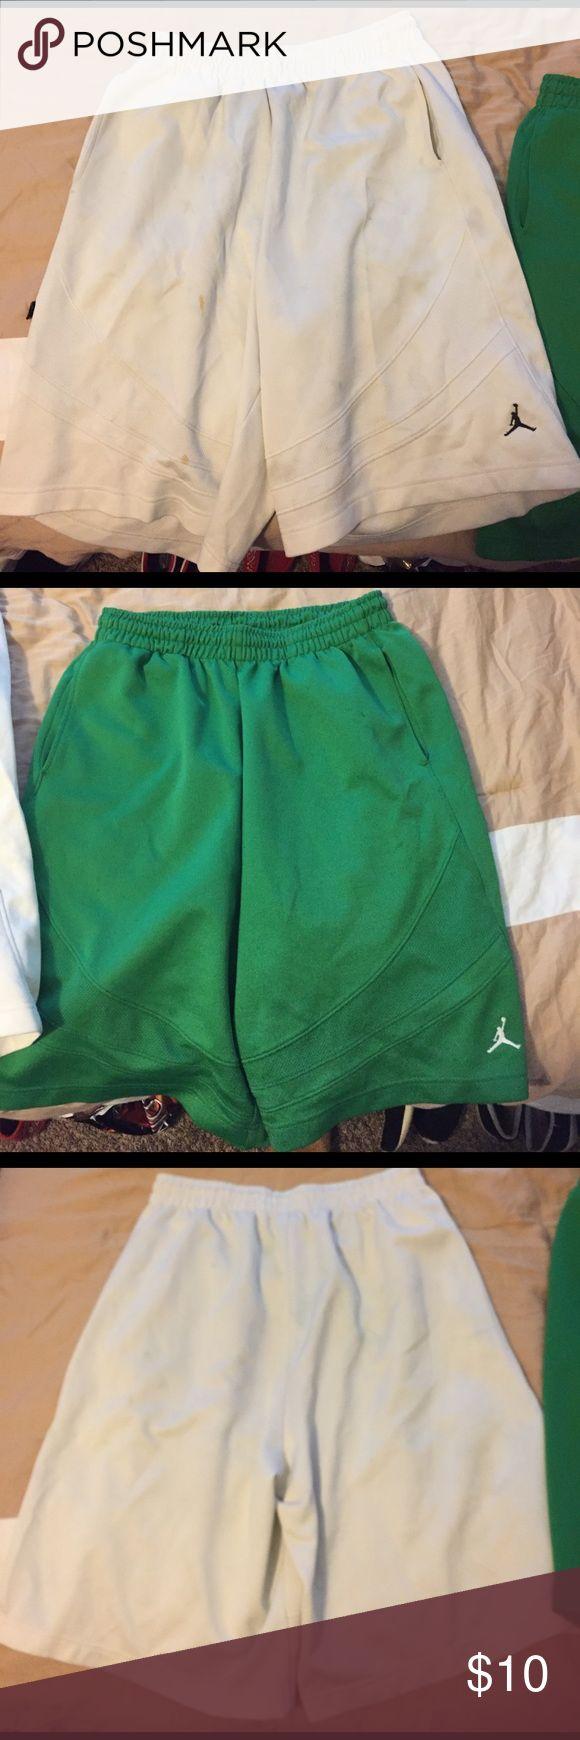 Green Jordan basketball shorts/White Jordan shorts A pair of green Jordan basketball shorts and a pair of white Jordan basketball shorts TOGETHER Jordan Shorts Athletic